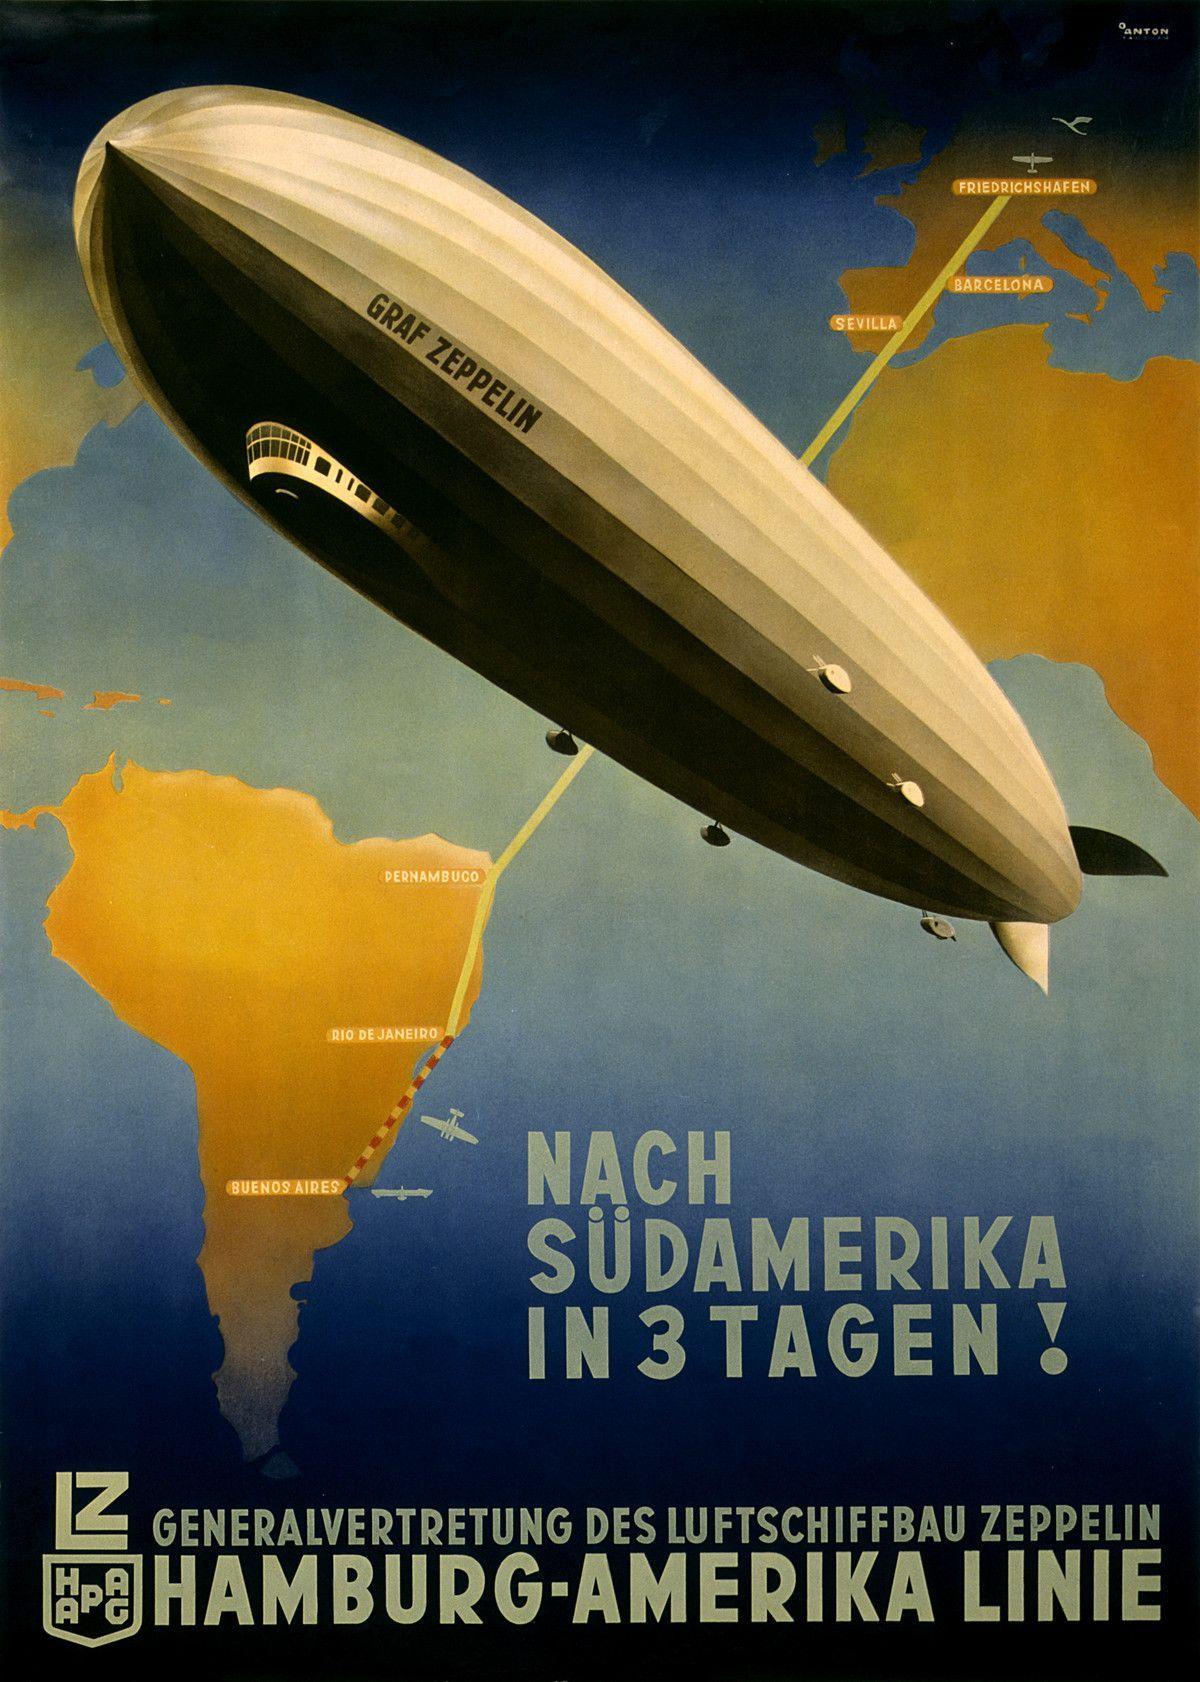 Zeppelin Across Atlantic Hamburg Travel Tourism Vintage Poster Repro FREE S//H